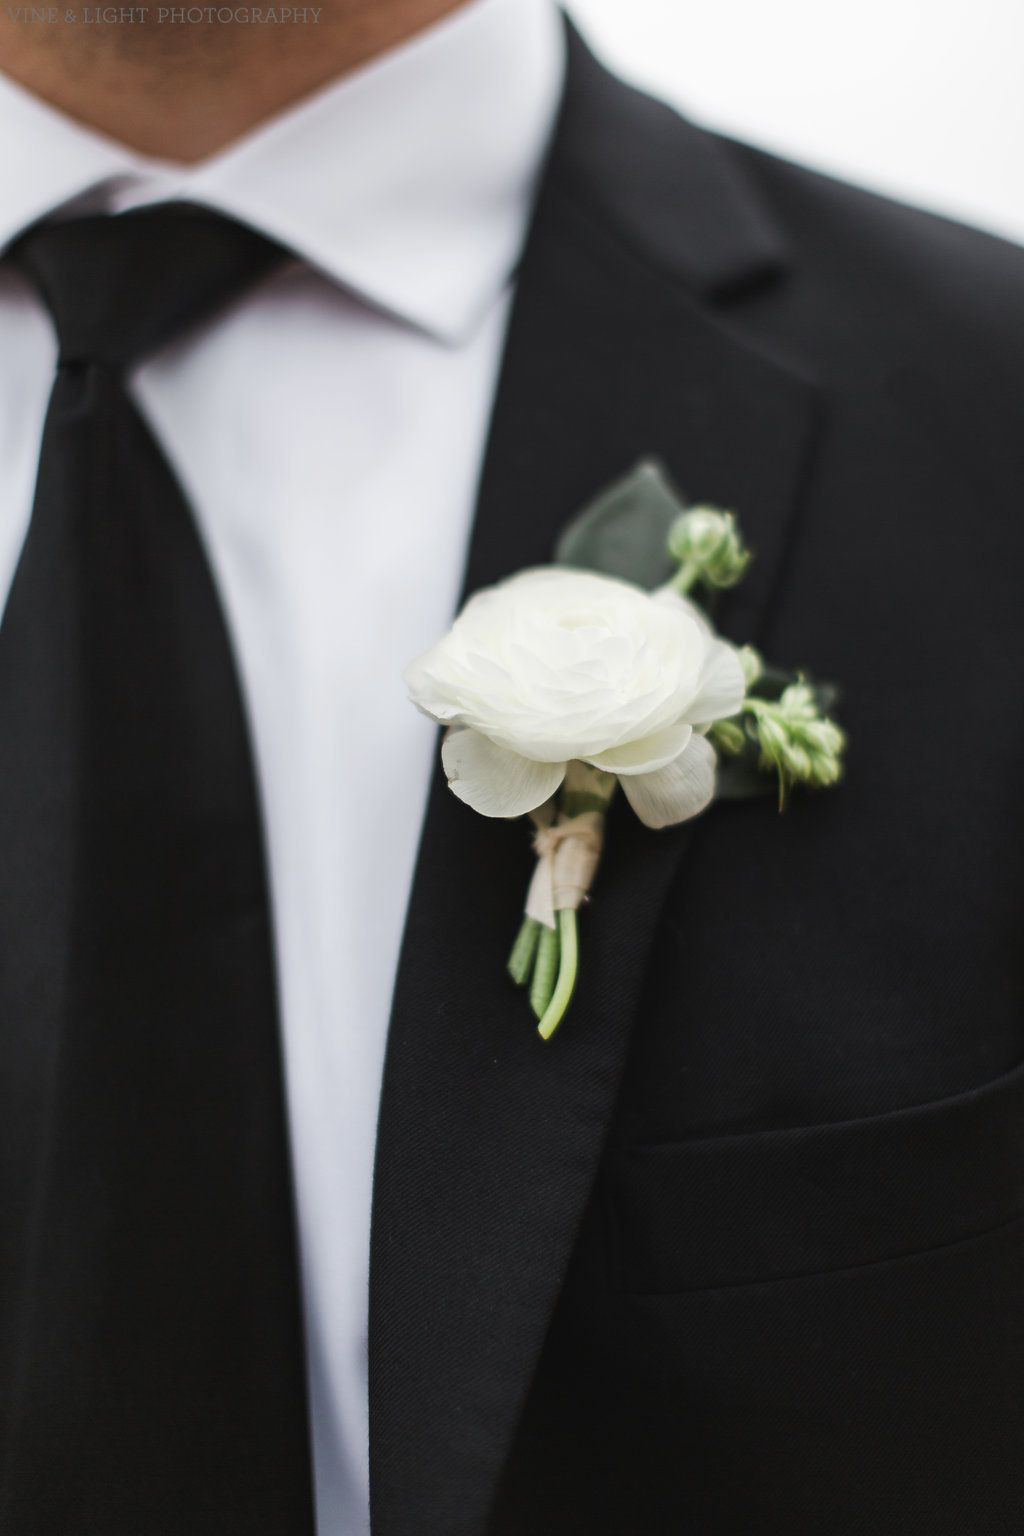 Classic Groom Boutonniere Of White Ranunculus And Larkspur Bud Ranunculus Boutonniere White Ranunculus Ranunculus